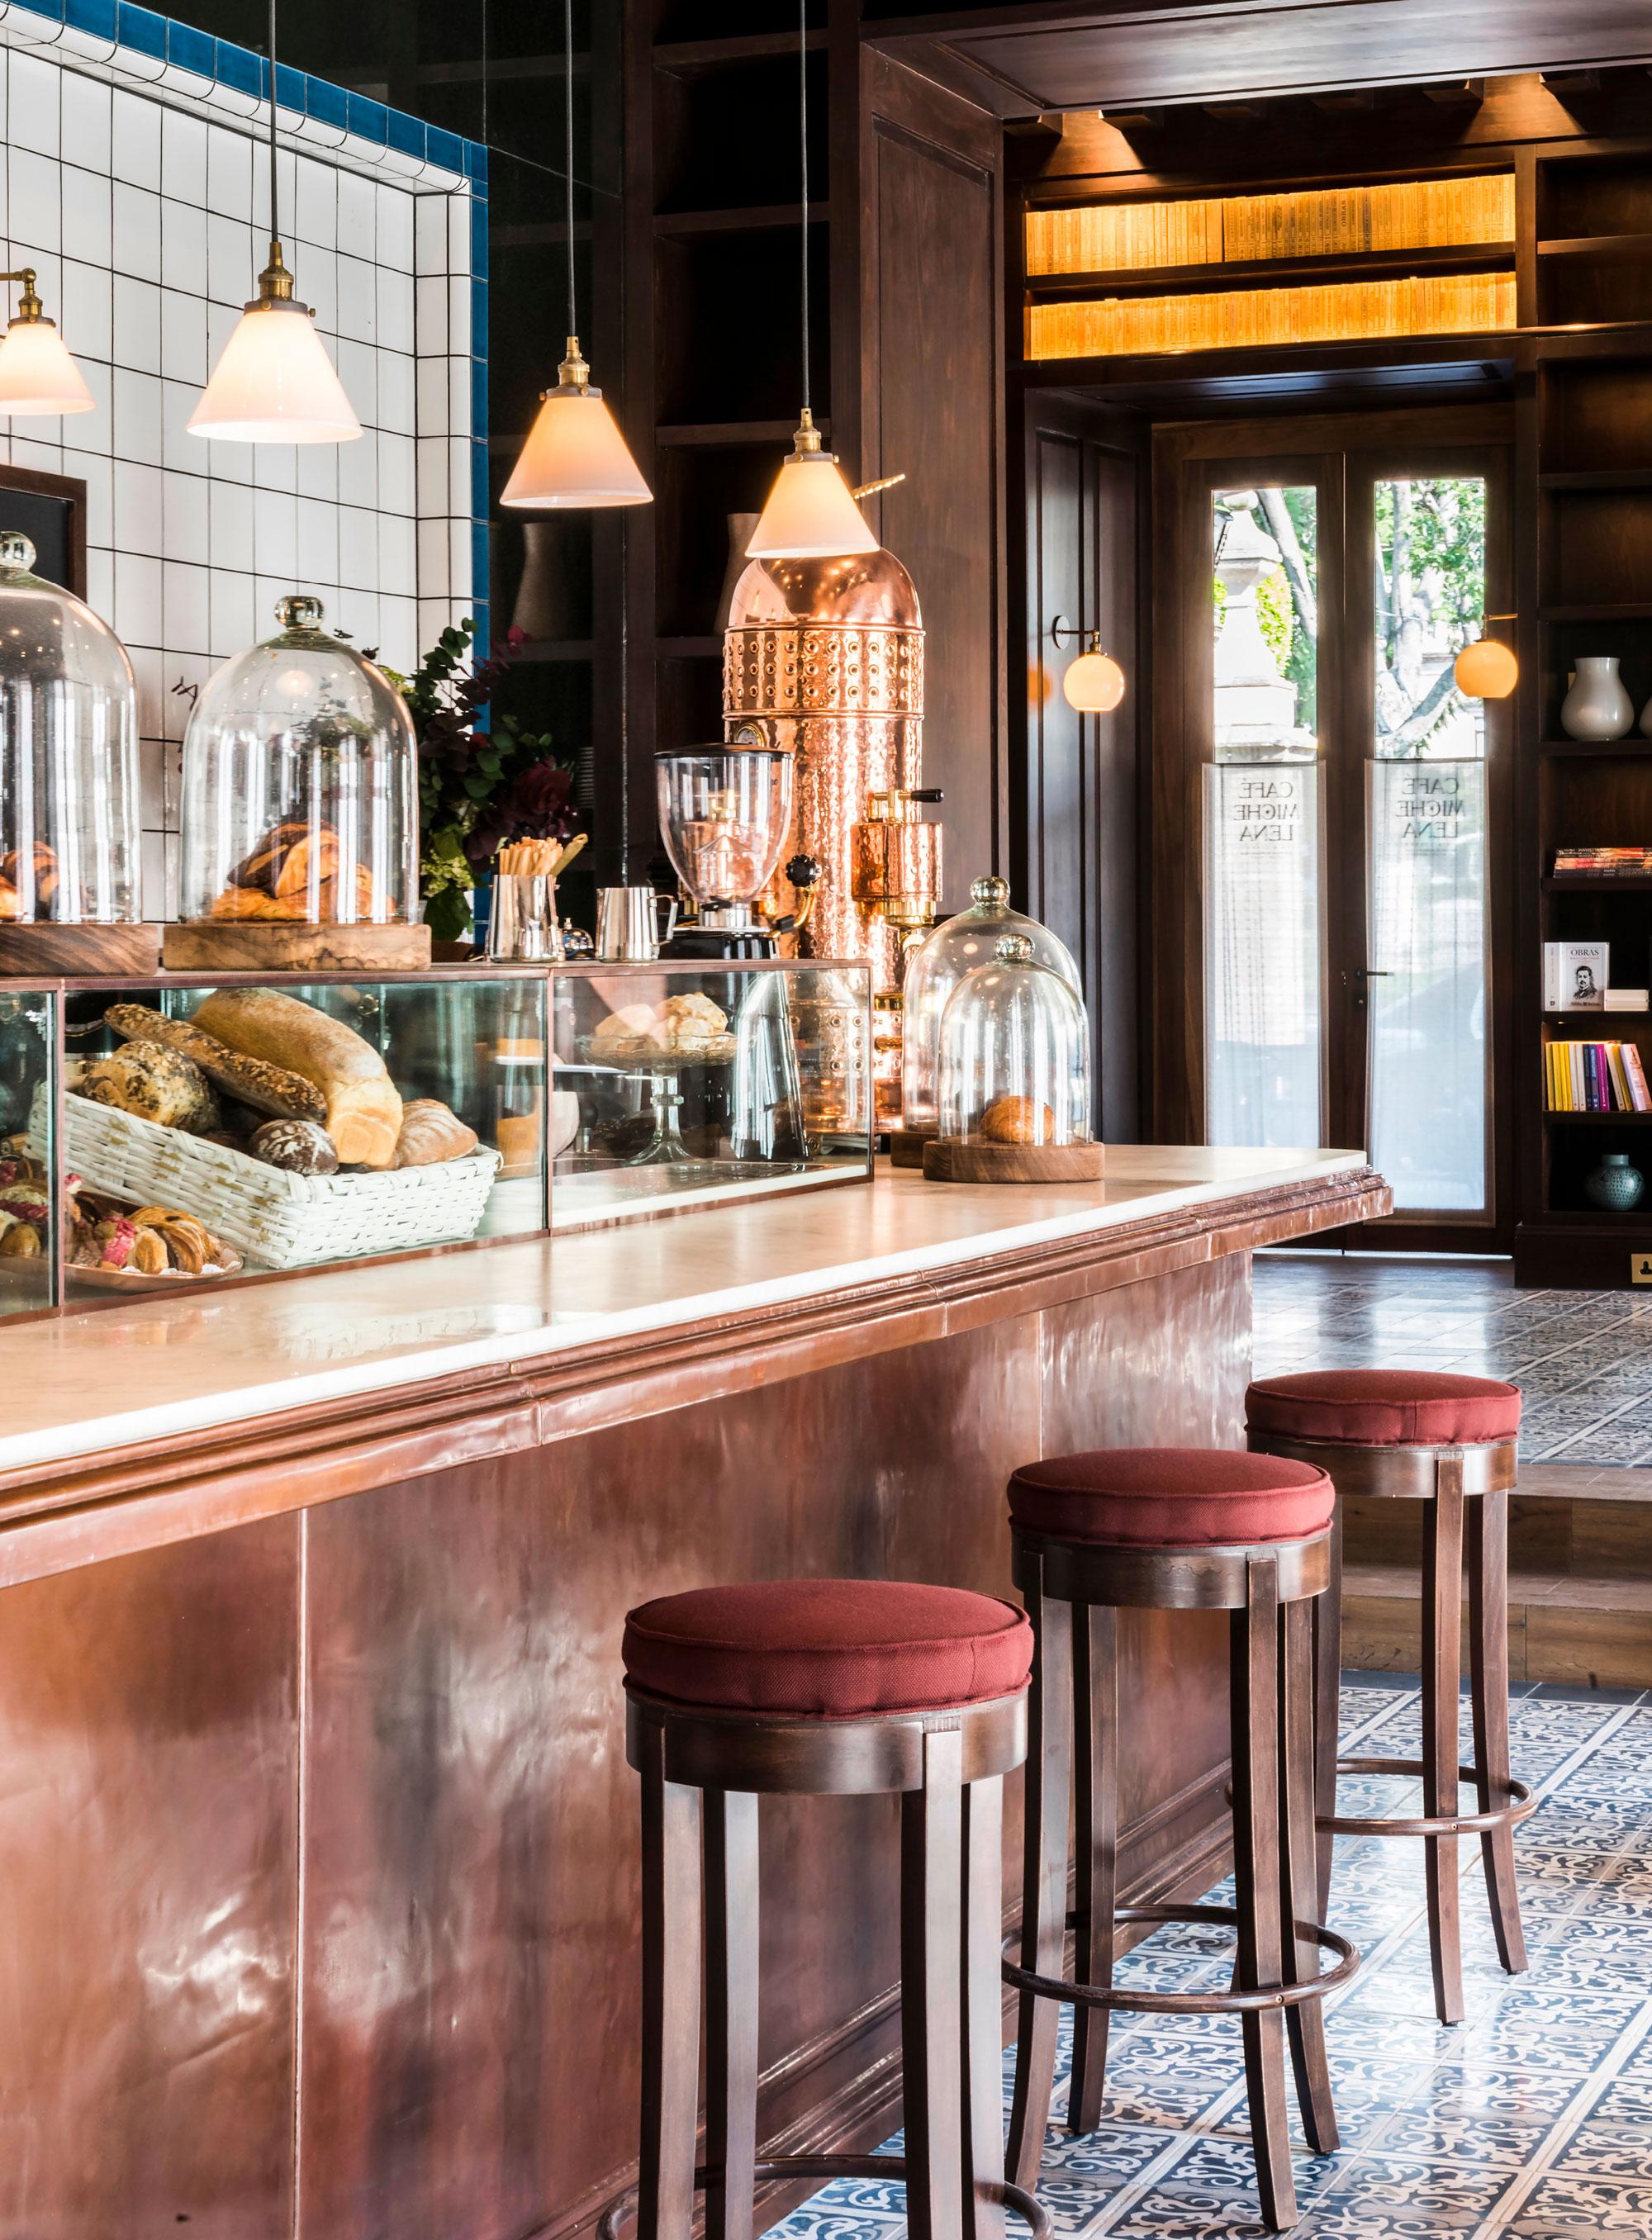 luis_laplace-Cafe_Michelena_Morelia-3